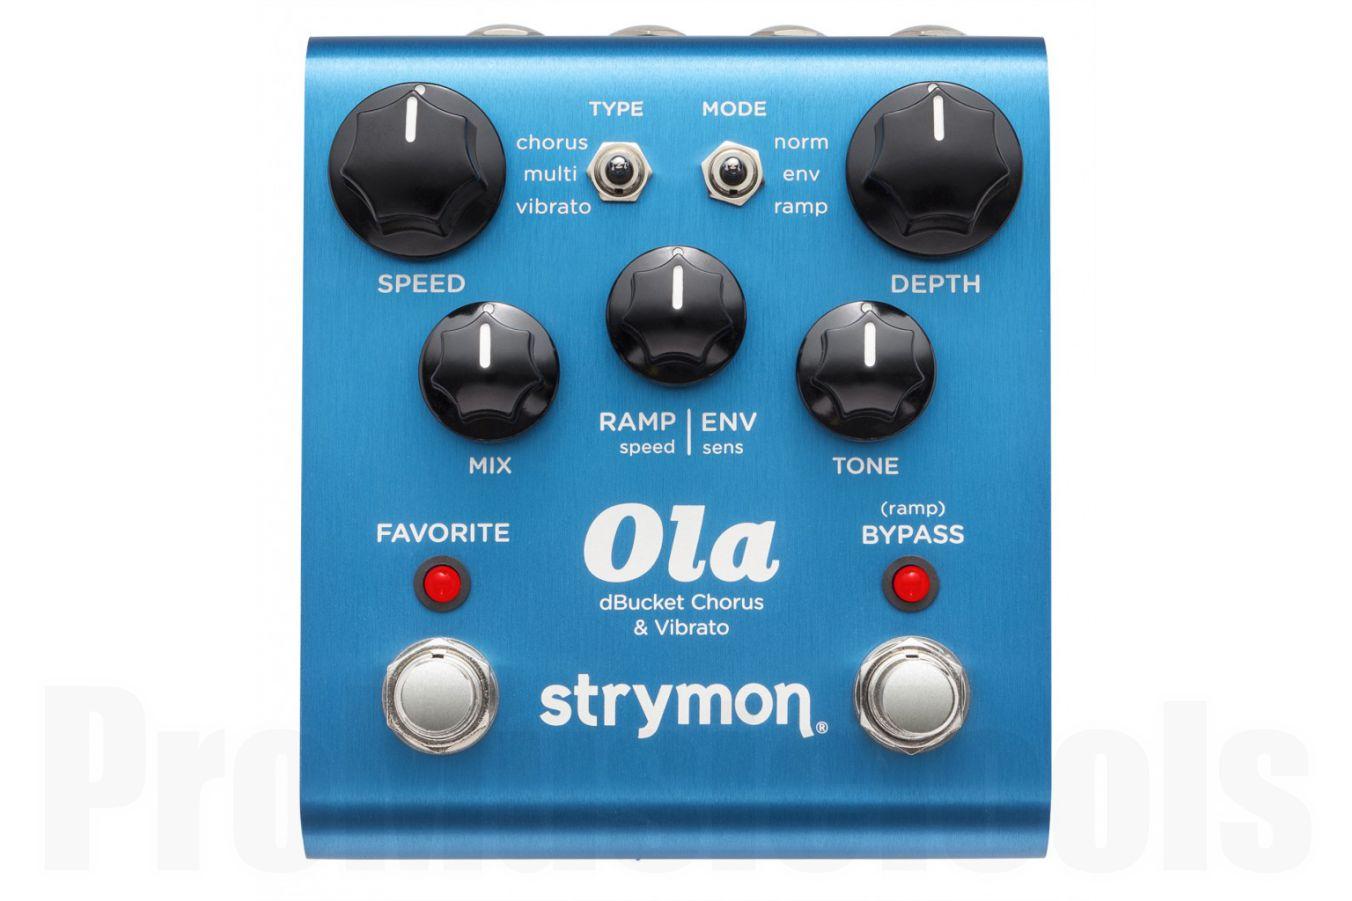 Strymon Ola - b-stock (1x opened box)